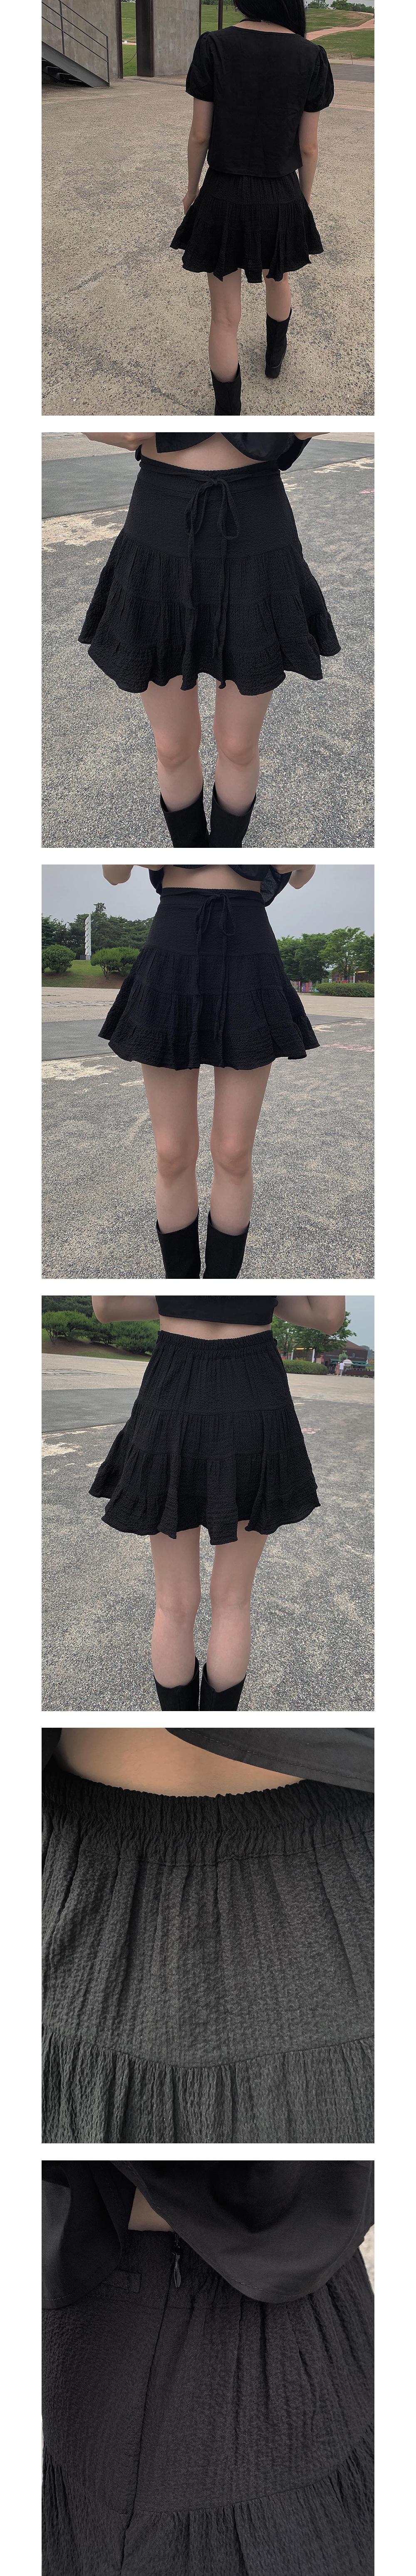 cancan strap skirt